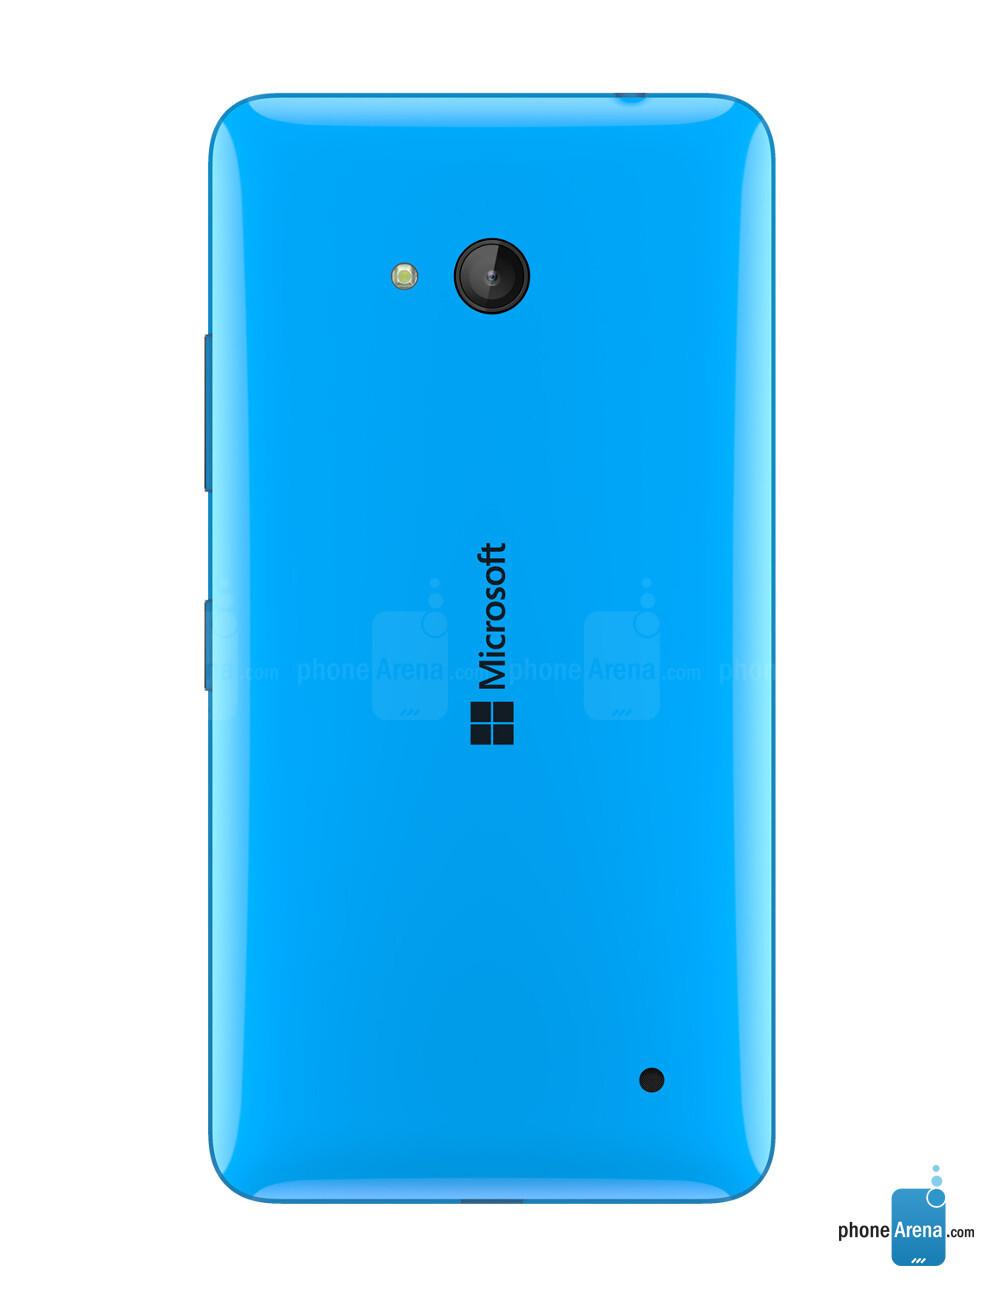 Microsoft Lumia 640 Lte User 28 Images Microsoft Lumia 640 Specs Tutorial How To De Brand